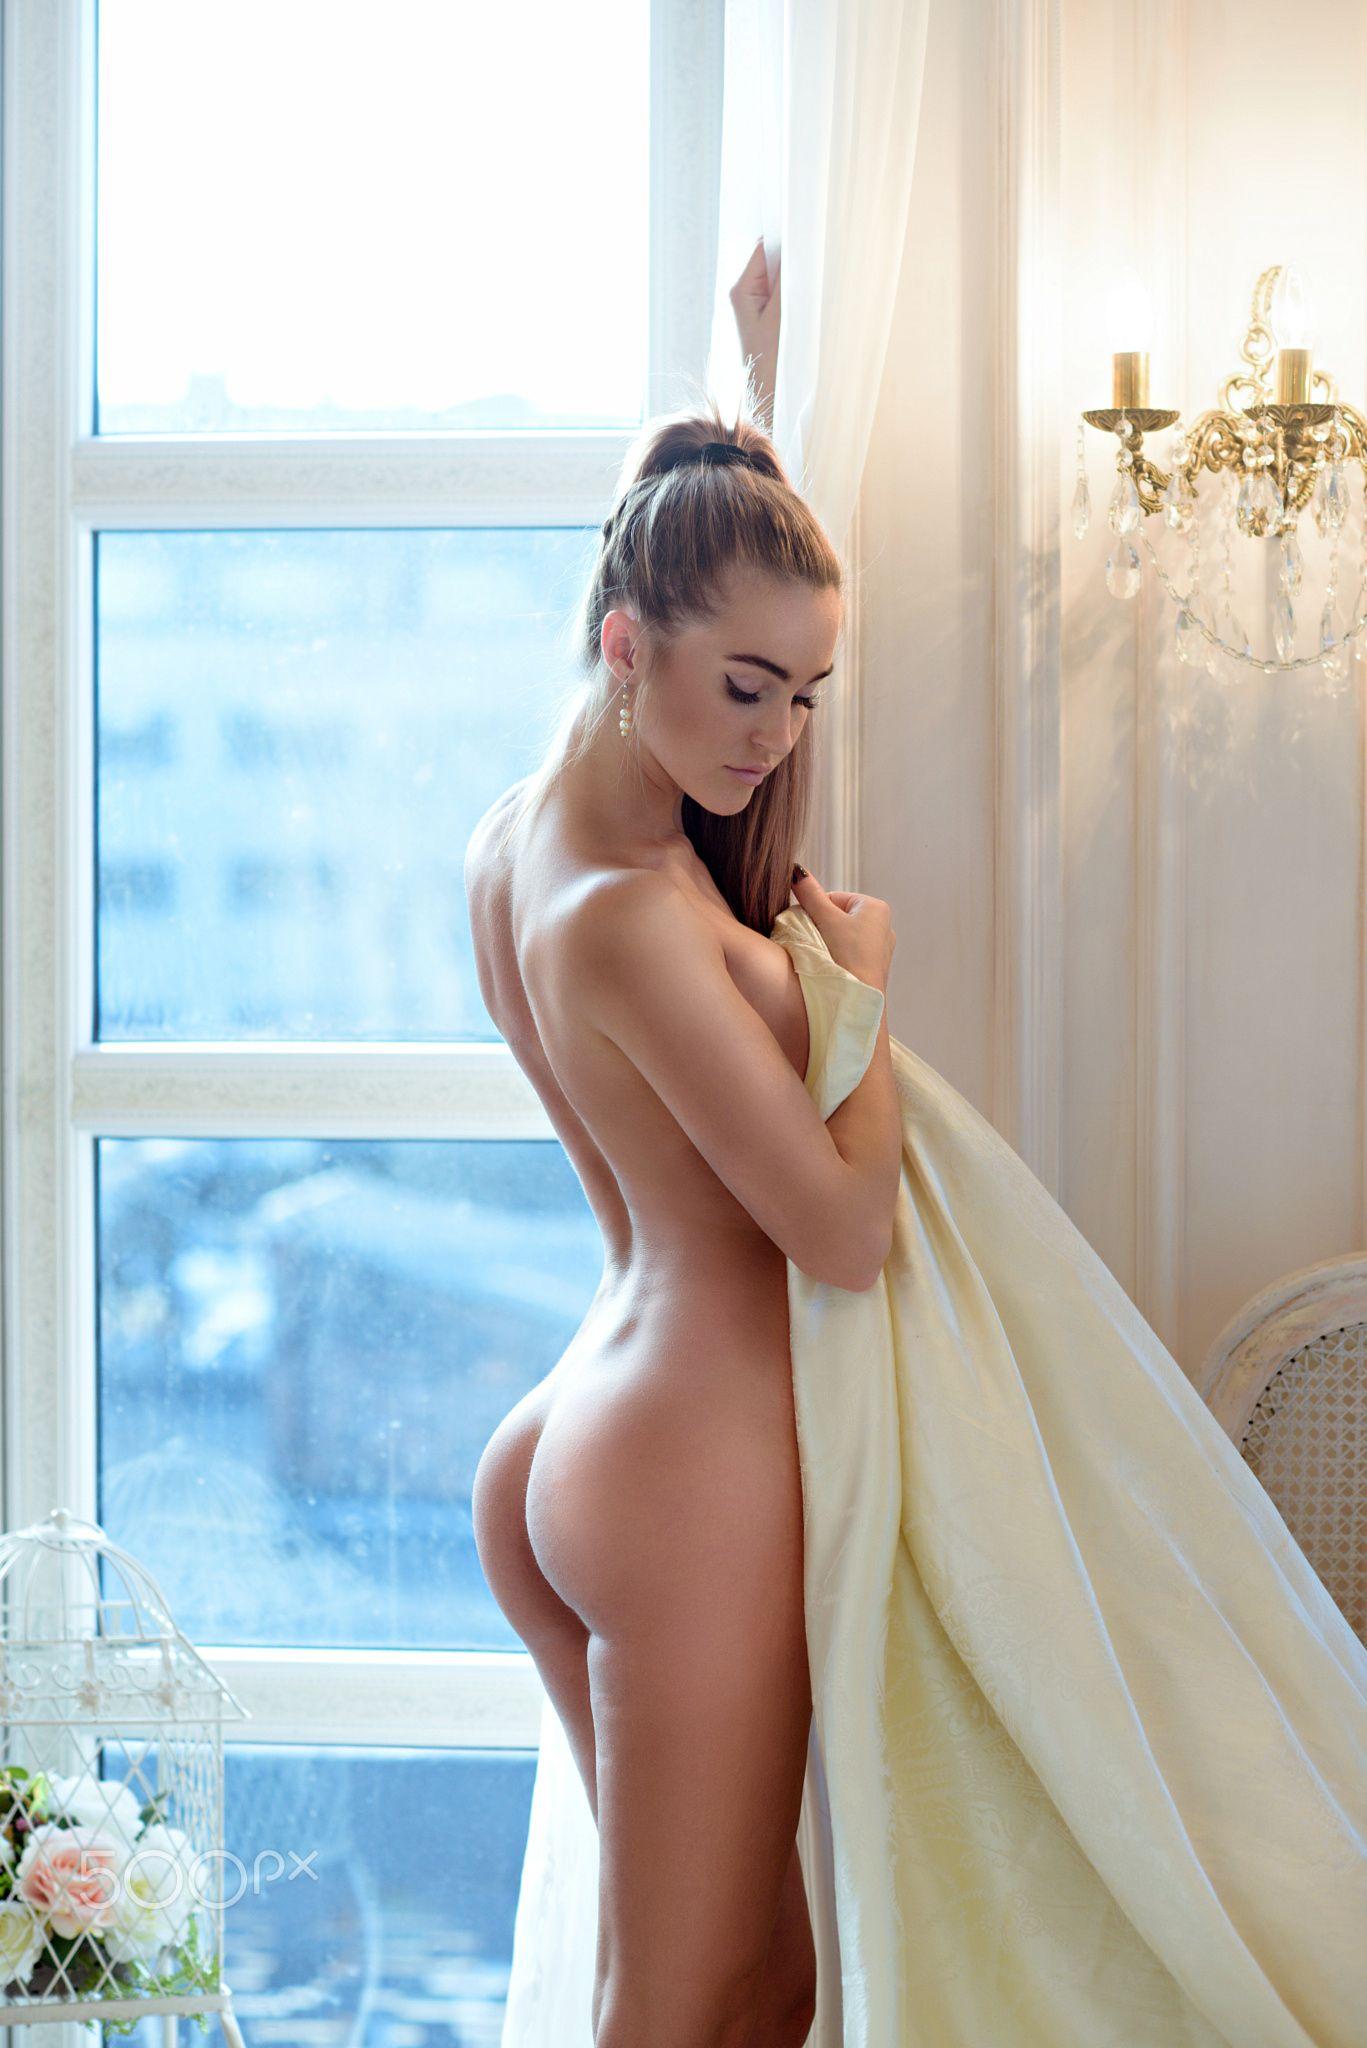 Beautiful blonde women nude